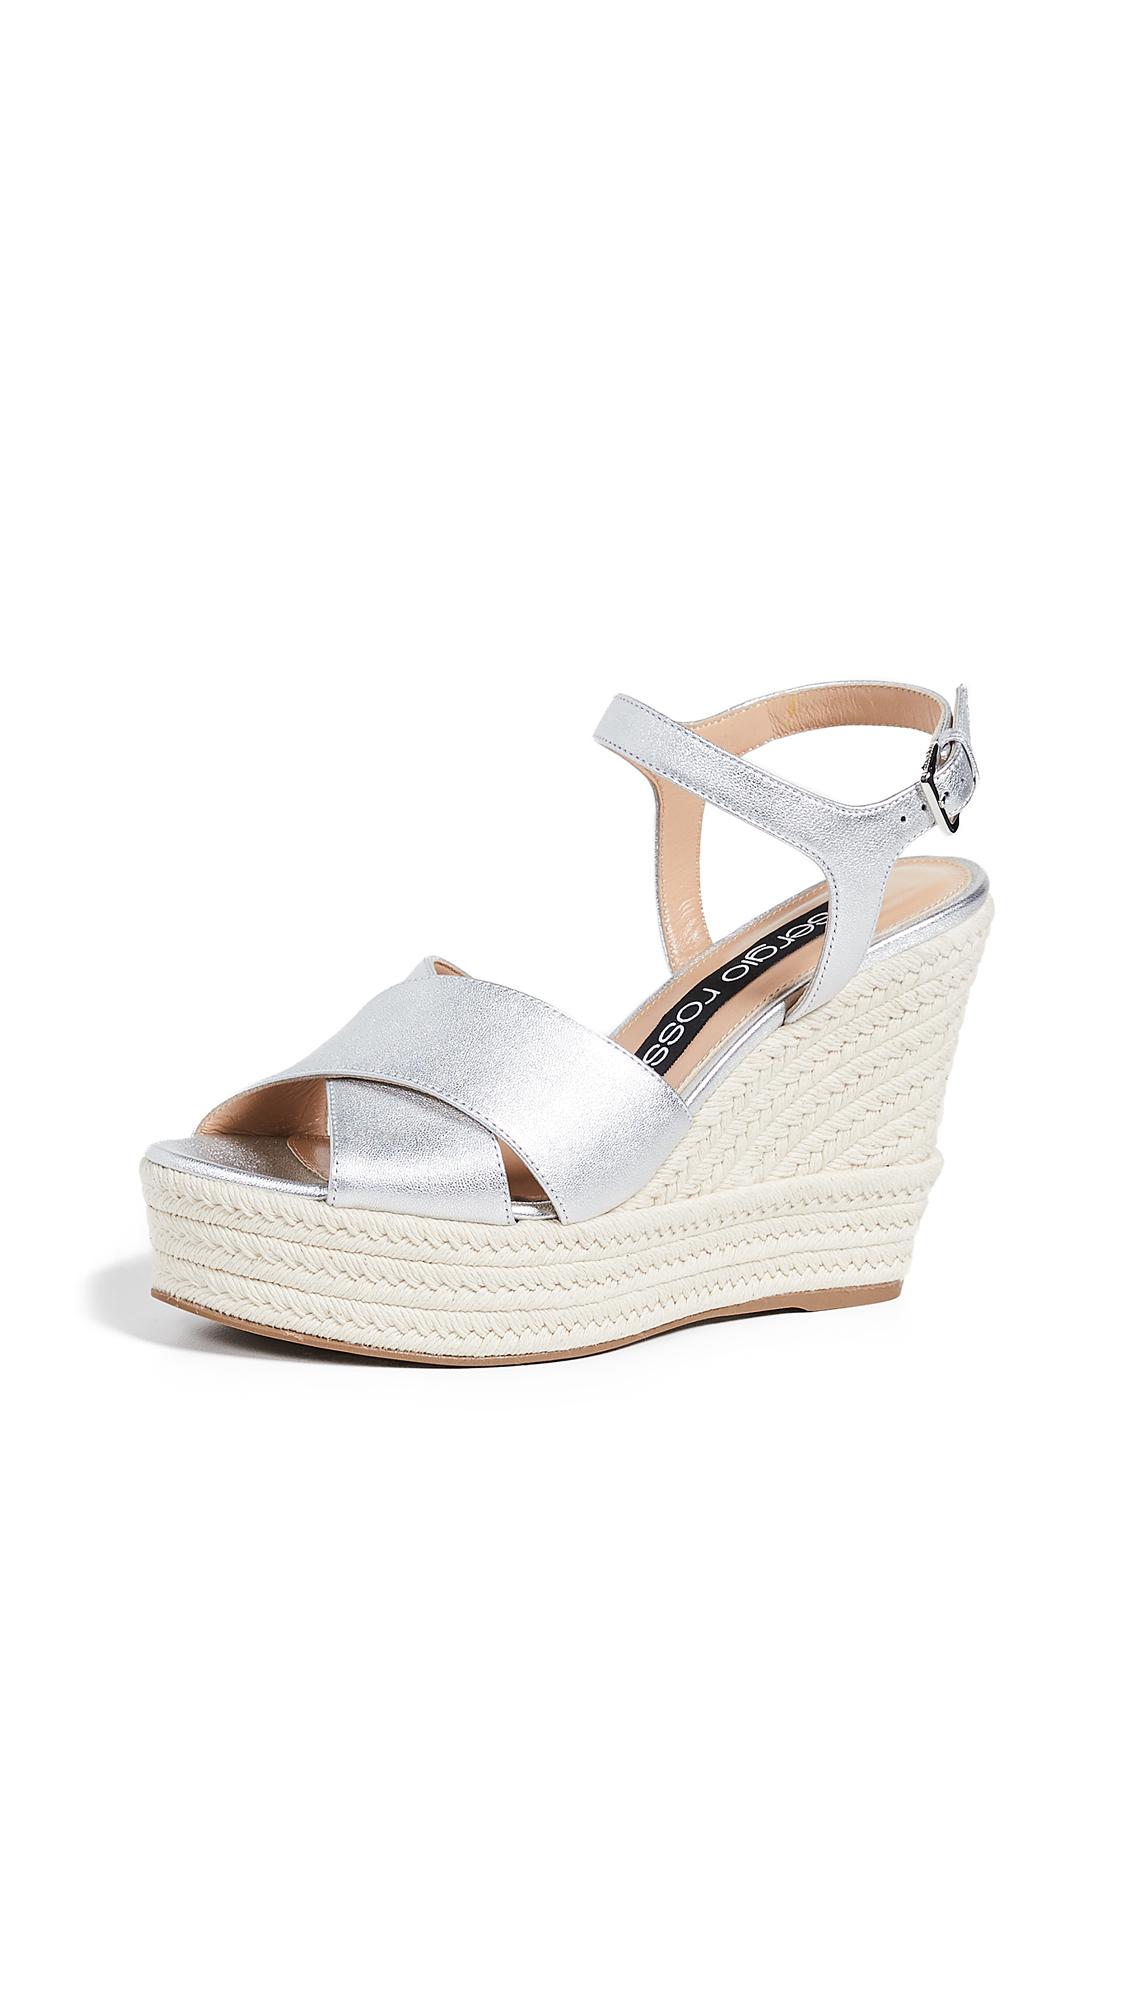 Sergio Rossi Gruppo Wedge Sandals - Argento